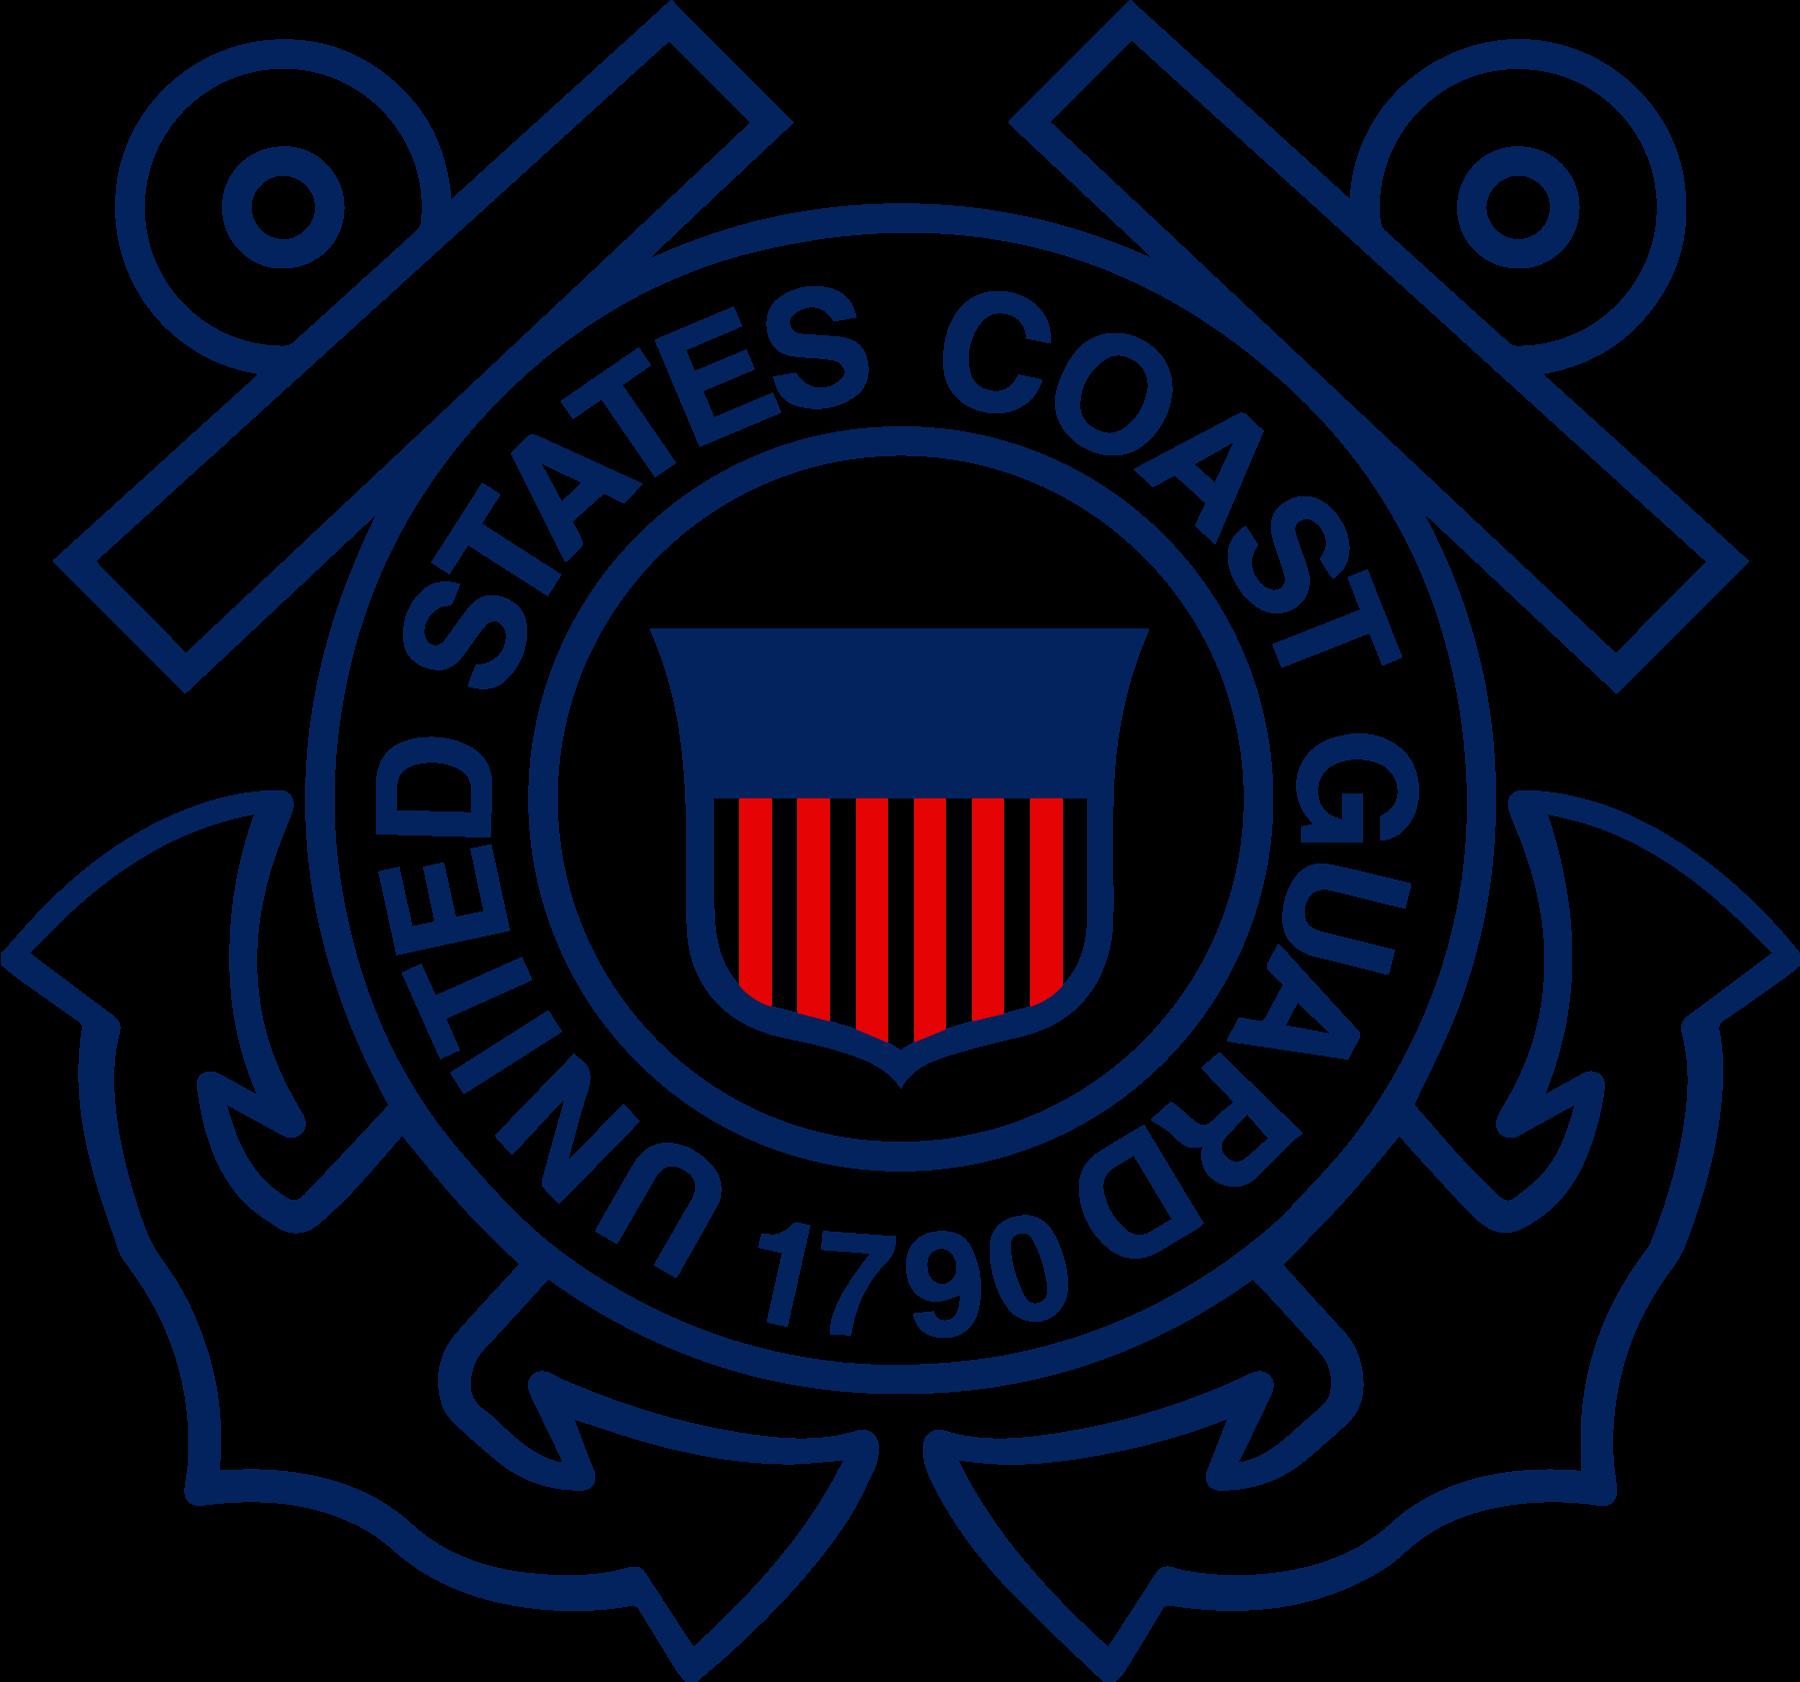 1800x1682 Clip Art Us Army Logo Clip Art